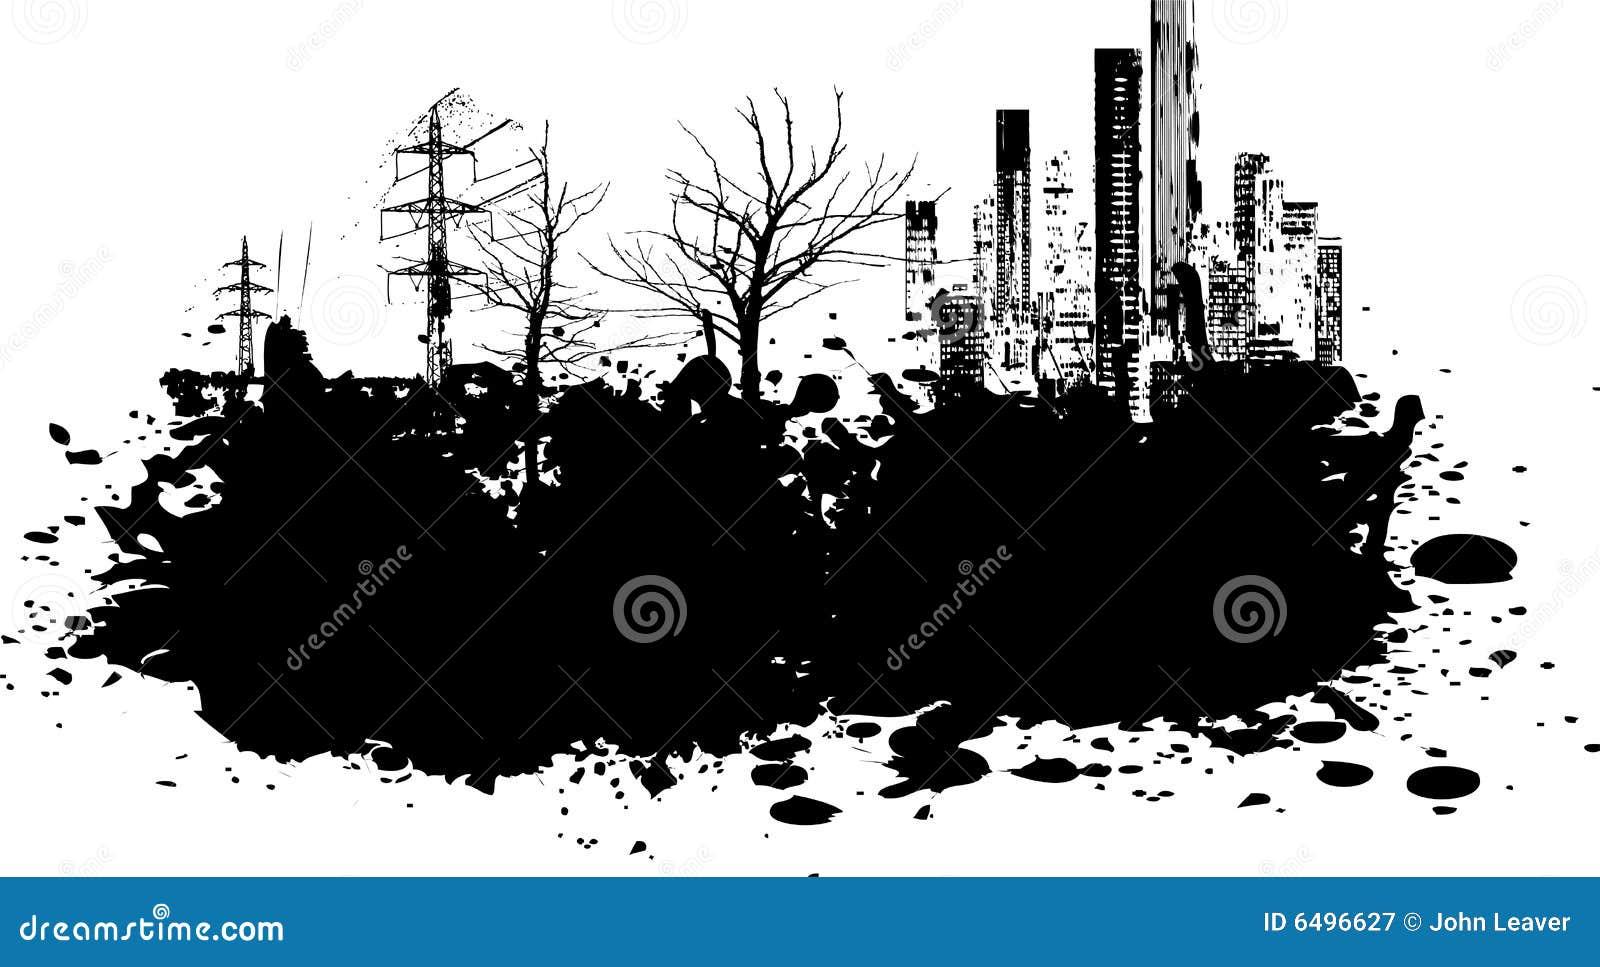 Grunge ilustracja